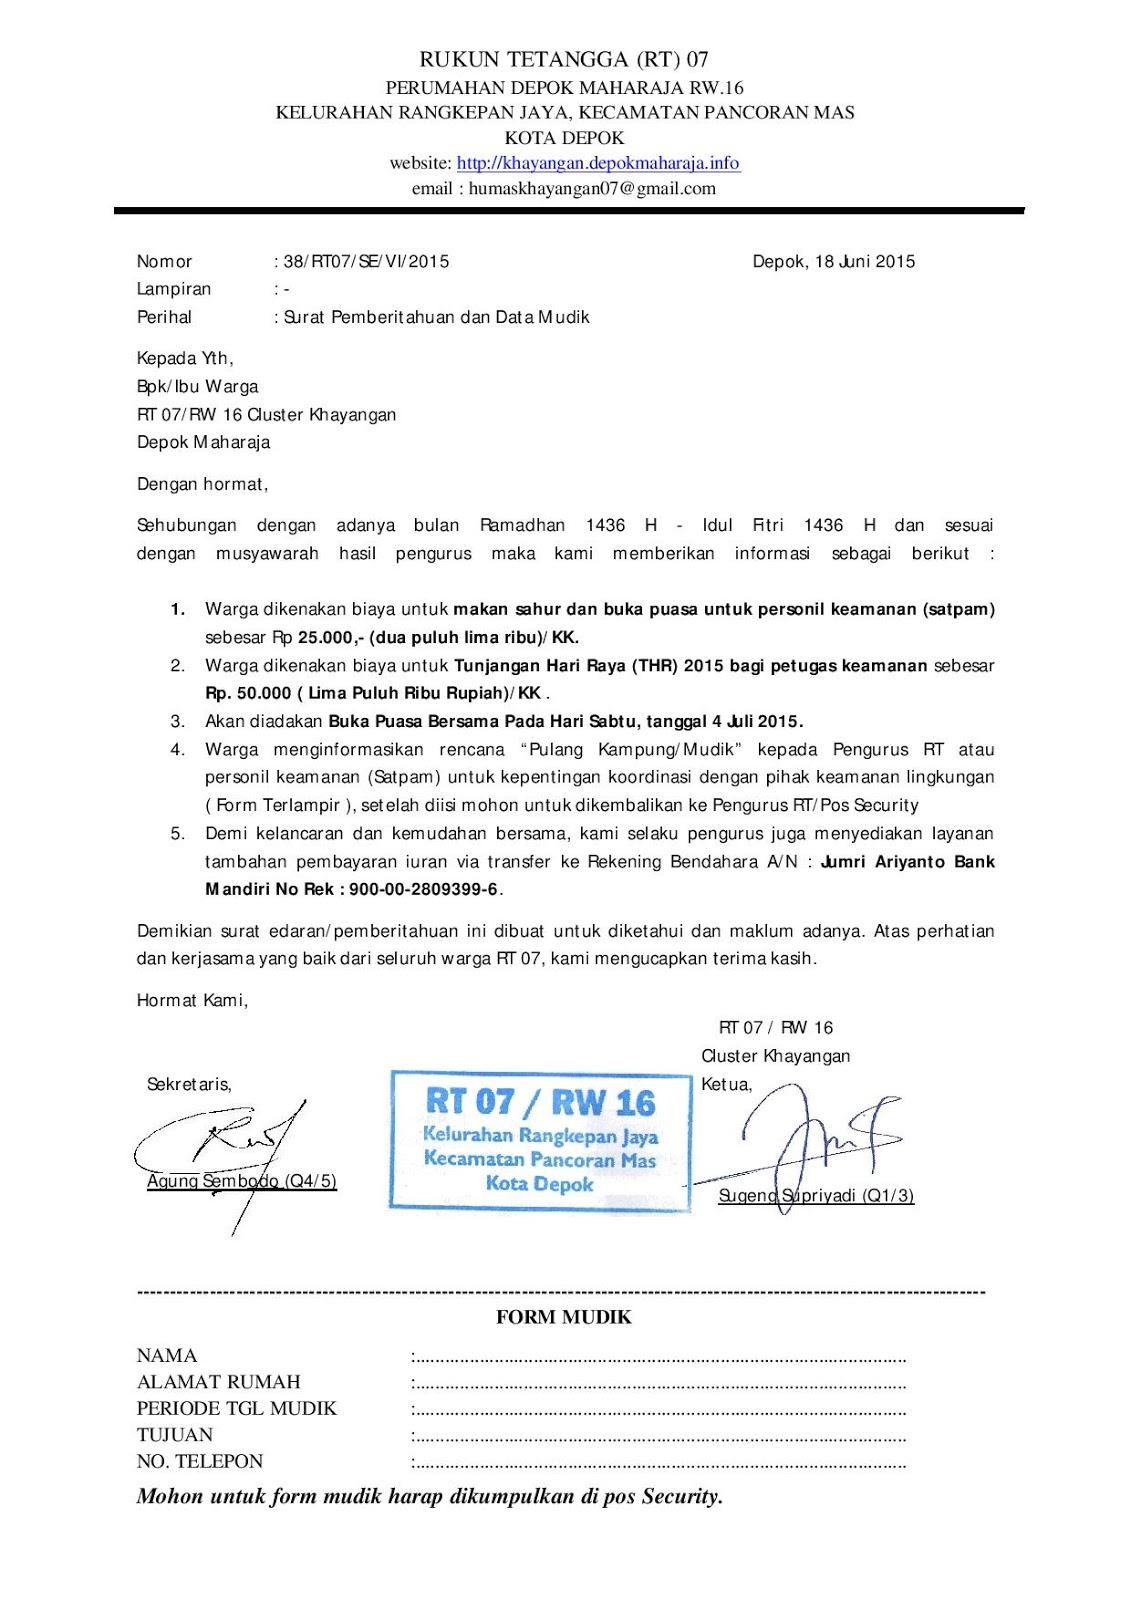 Surat Edaran Terkait Thr Security Buka Bersama Dan Form Mudik